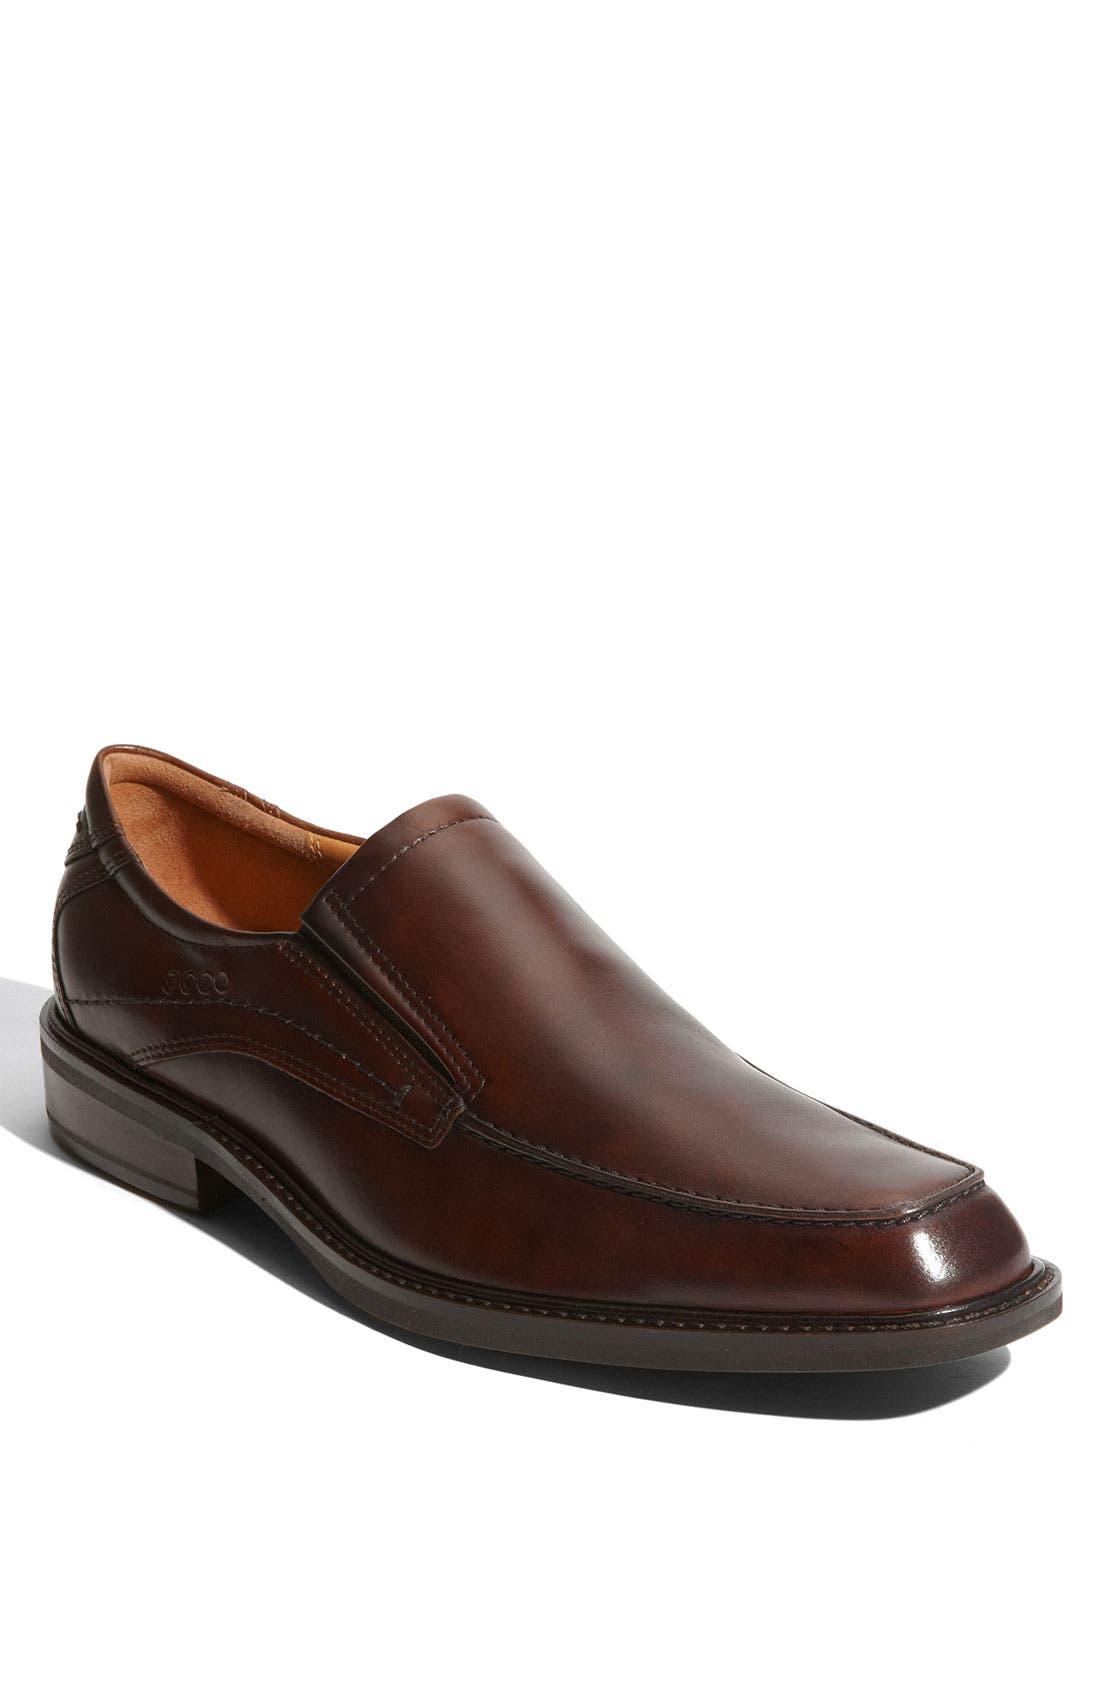 ecco edinburgh loafer